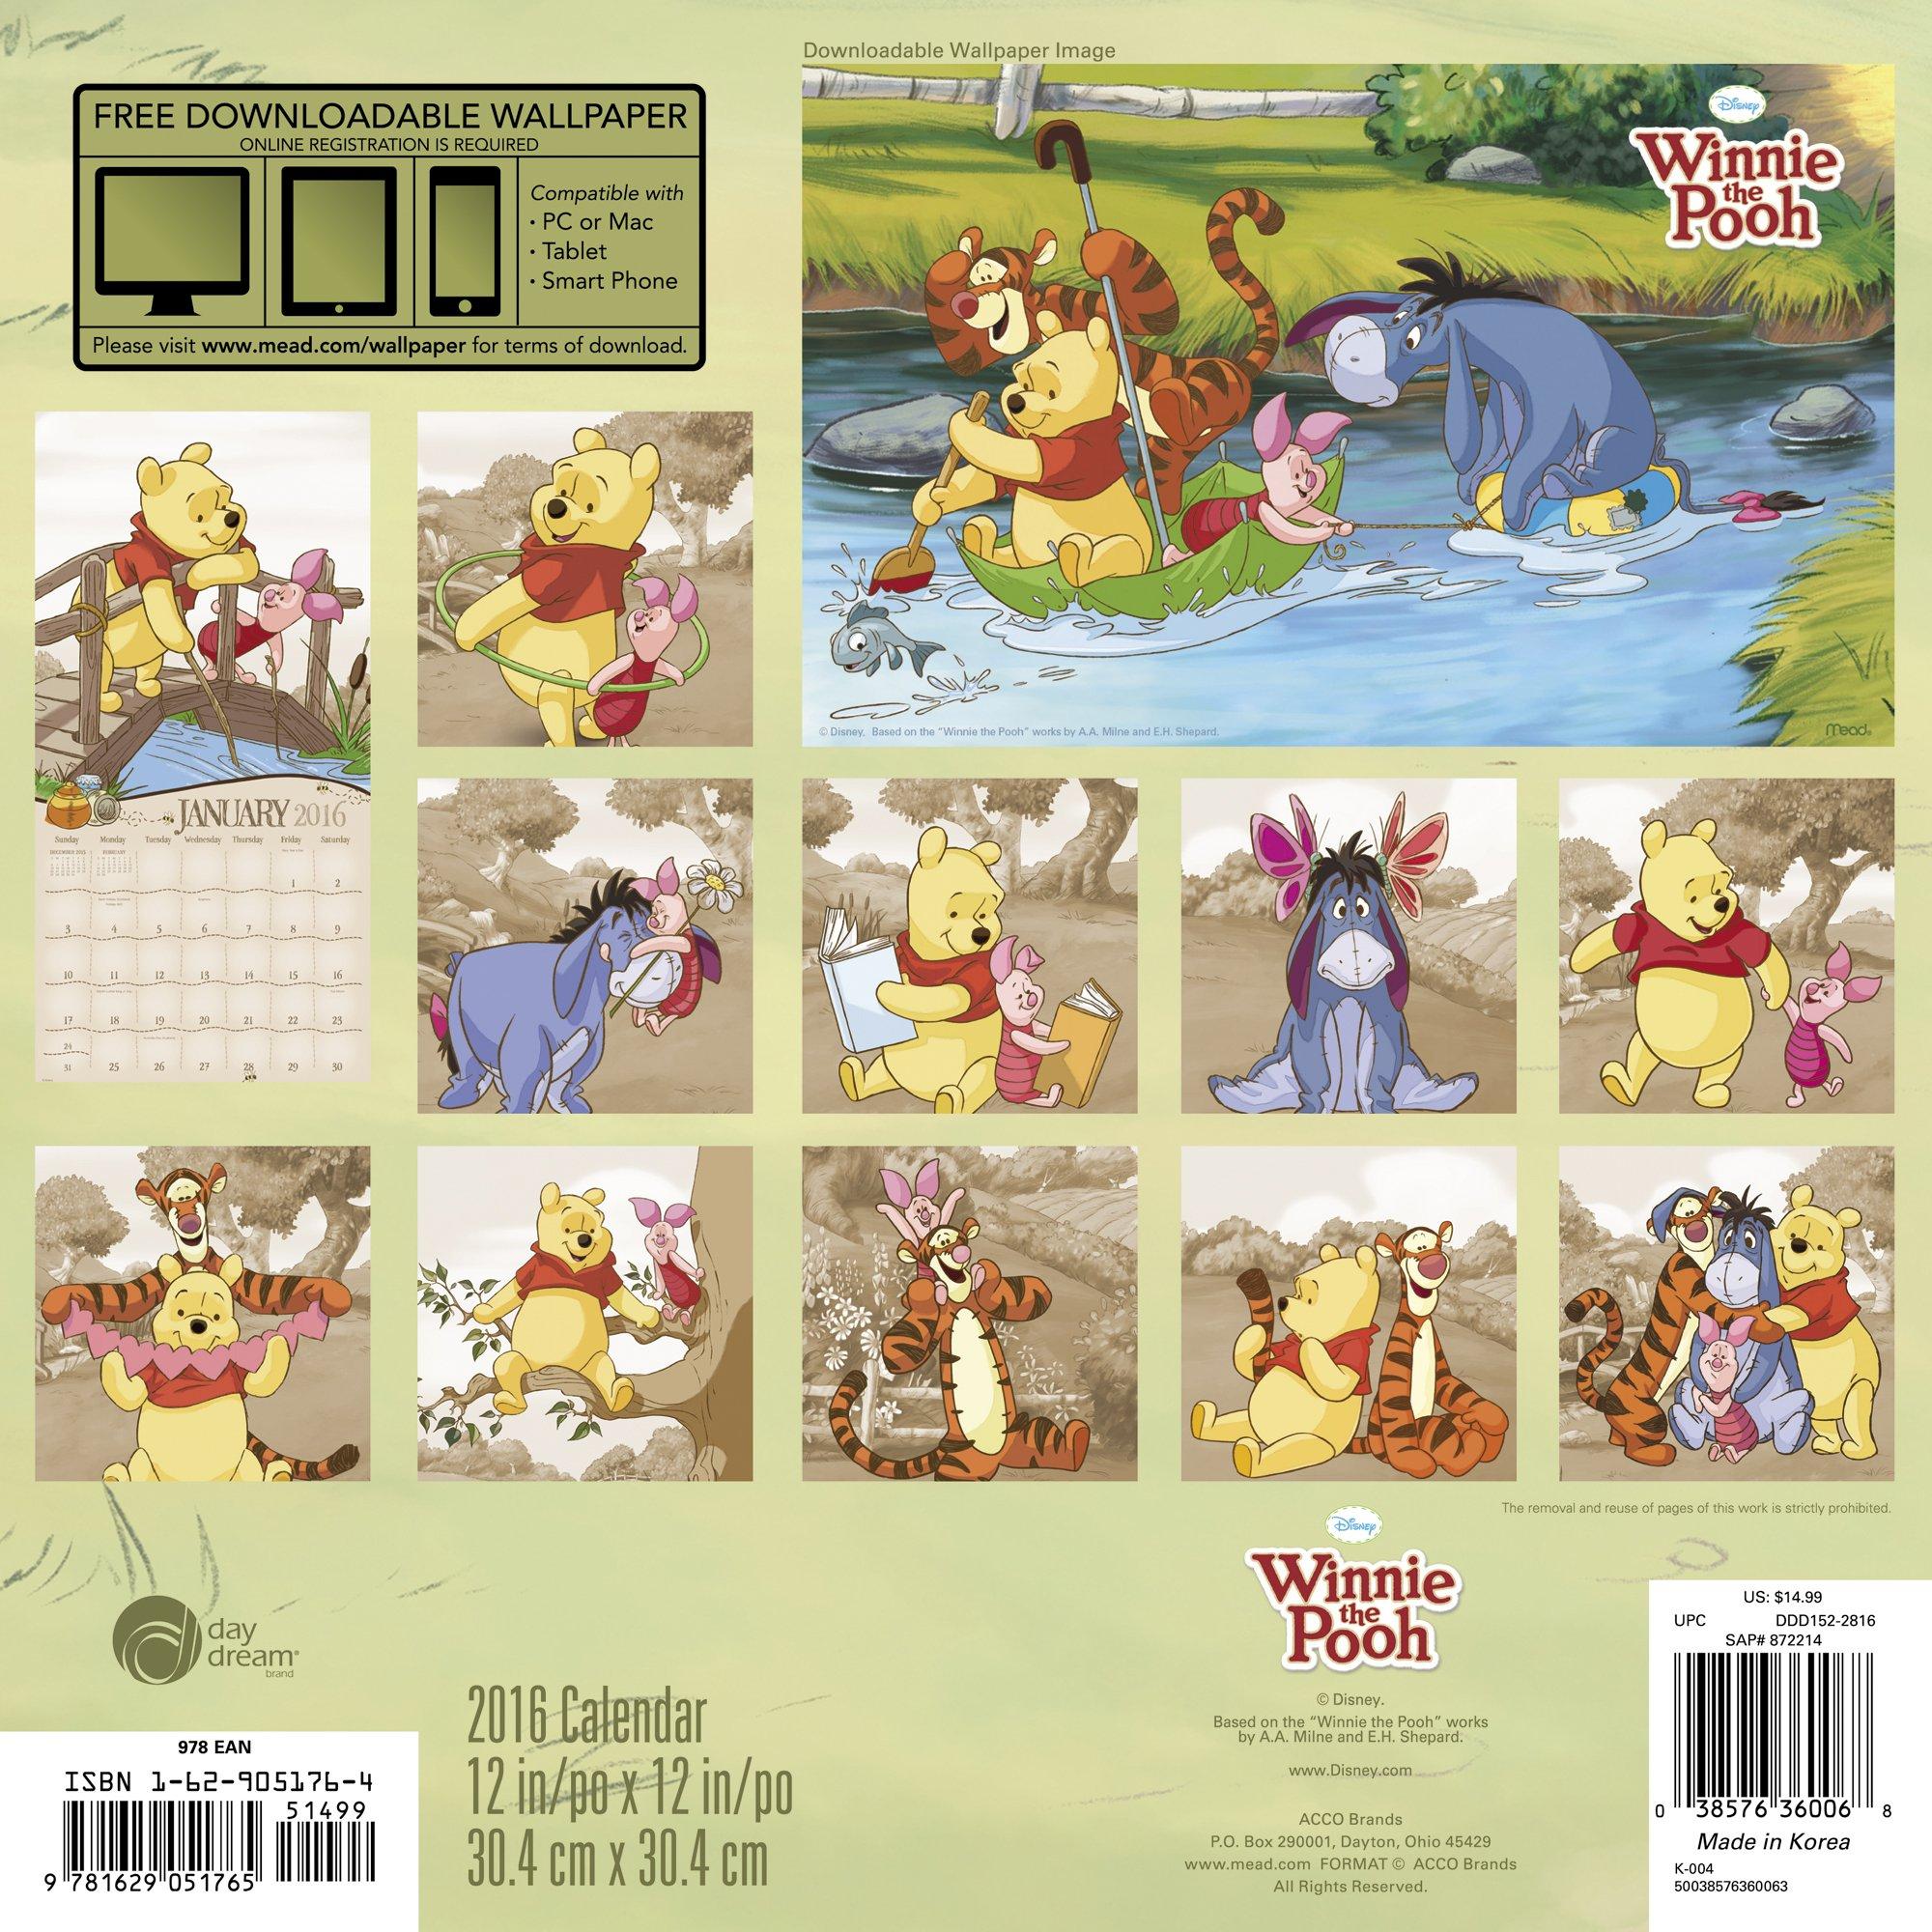 Disney winnie the pooh 2016 calendar includes bonus downloadable disney winnie the pooh 2016 calendar includes bonus downloadable wallpaper amazon 0038576360068 books voltagebd Gallery